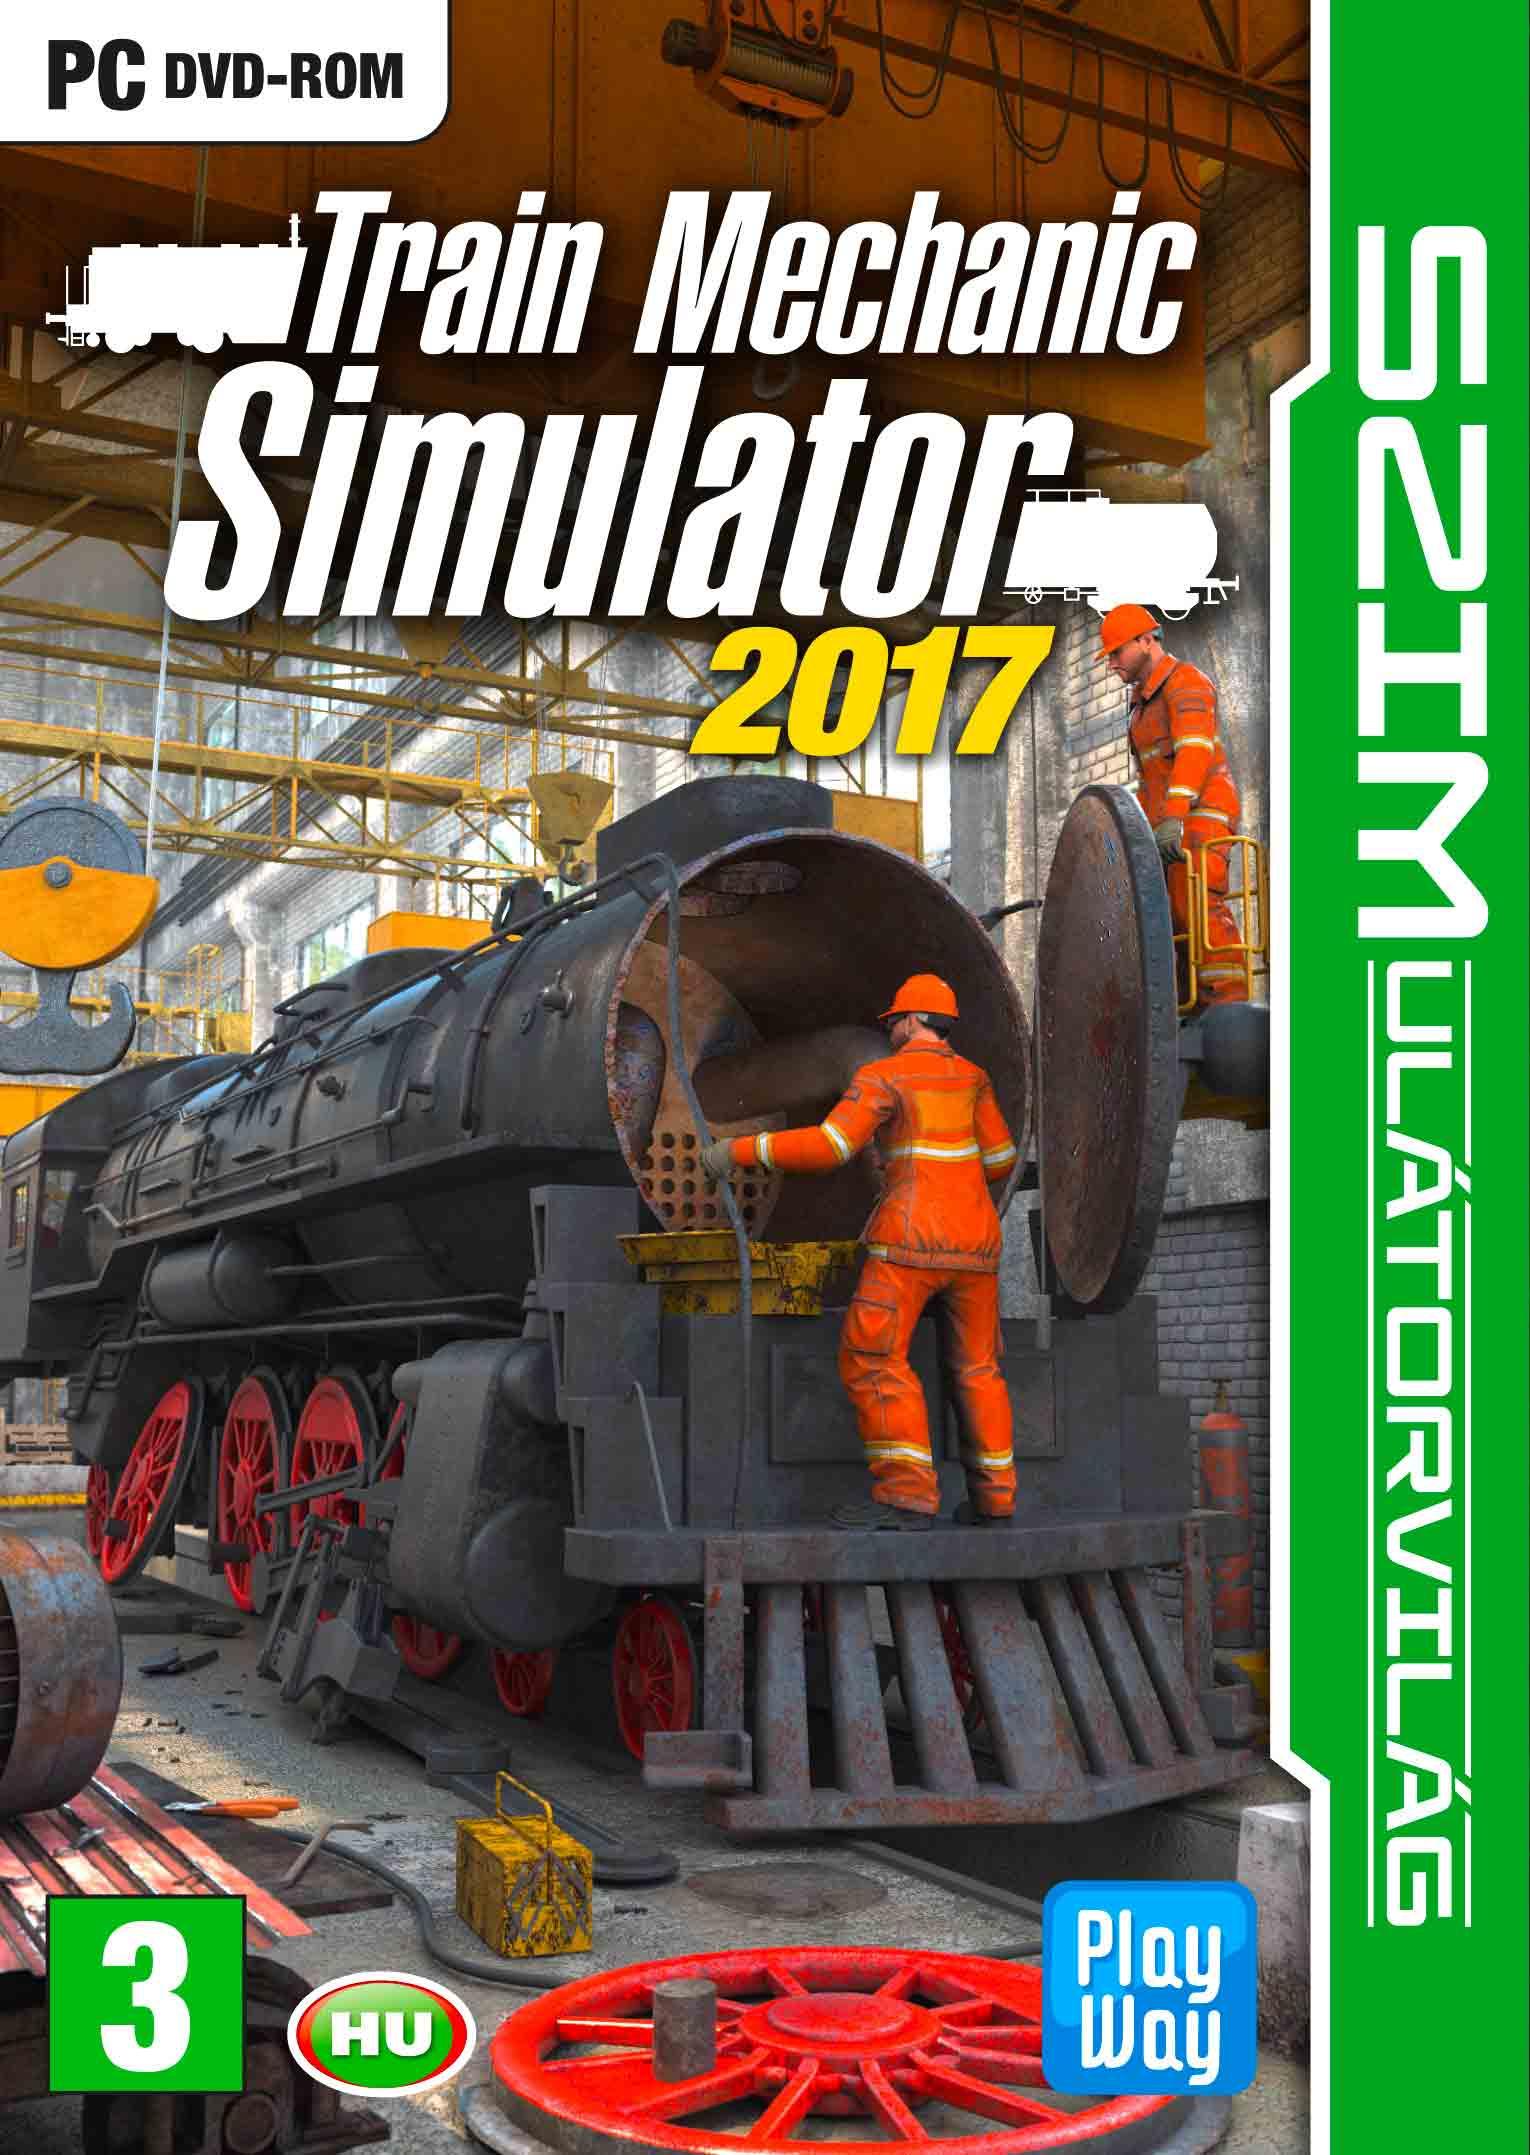 train mechanic simulator 2017 pc akci s r konzolvil g. Black Bedroom Furniture Sets. Home Design Ideas